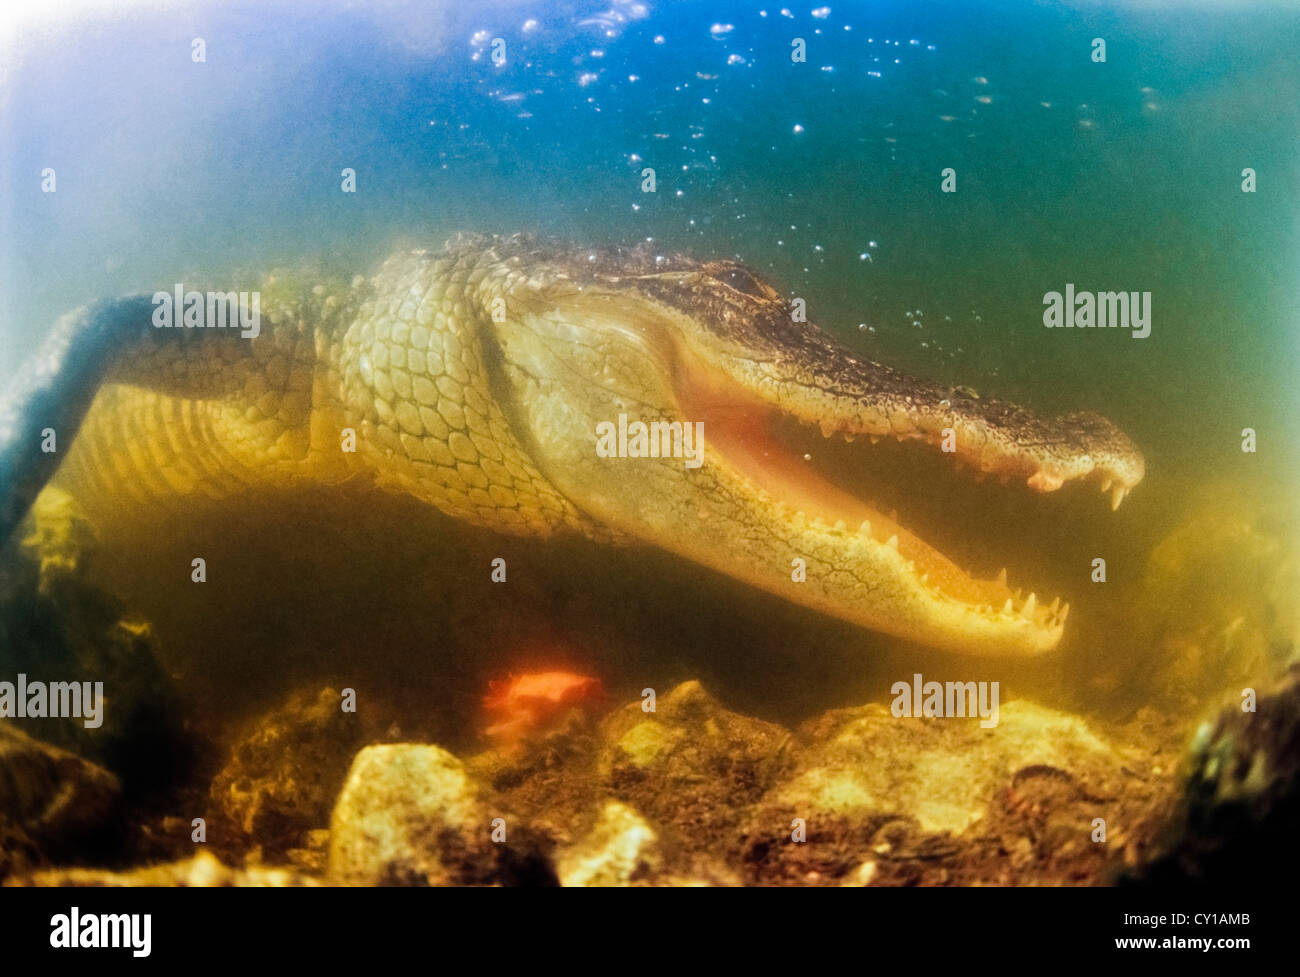 American Alligator, Alligator mississippiensis, Everglades National Park, Florida, USA - Stock Image